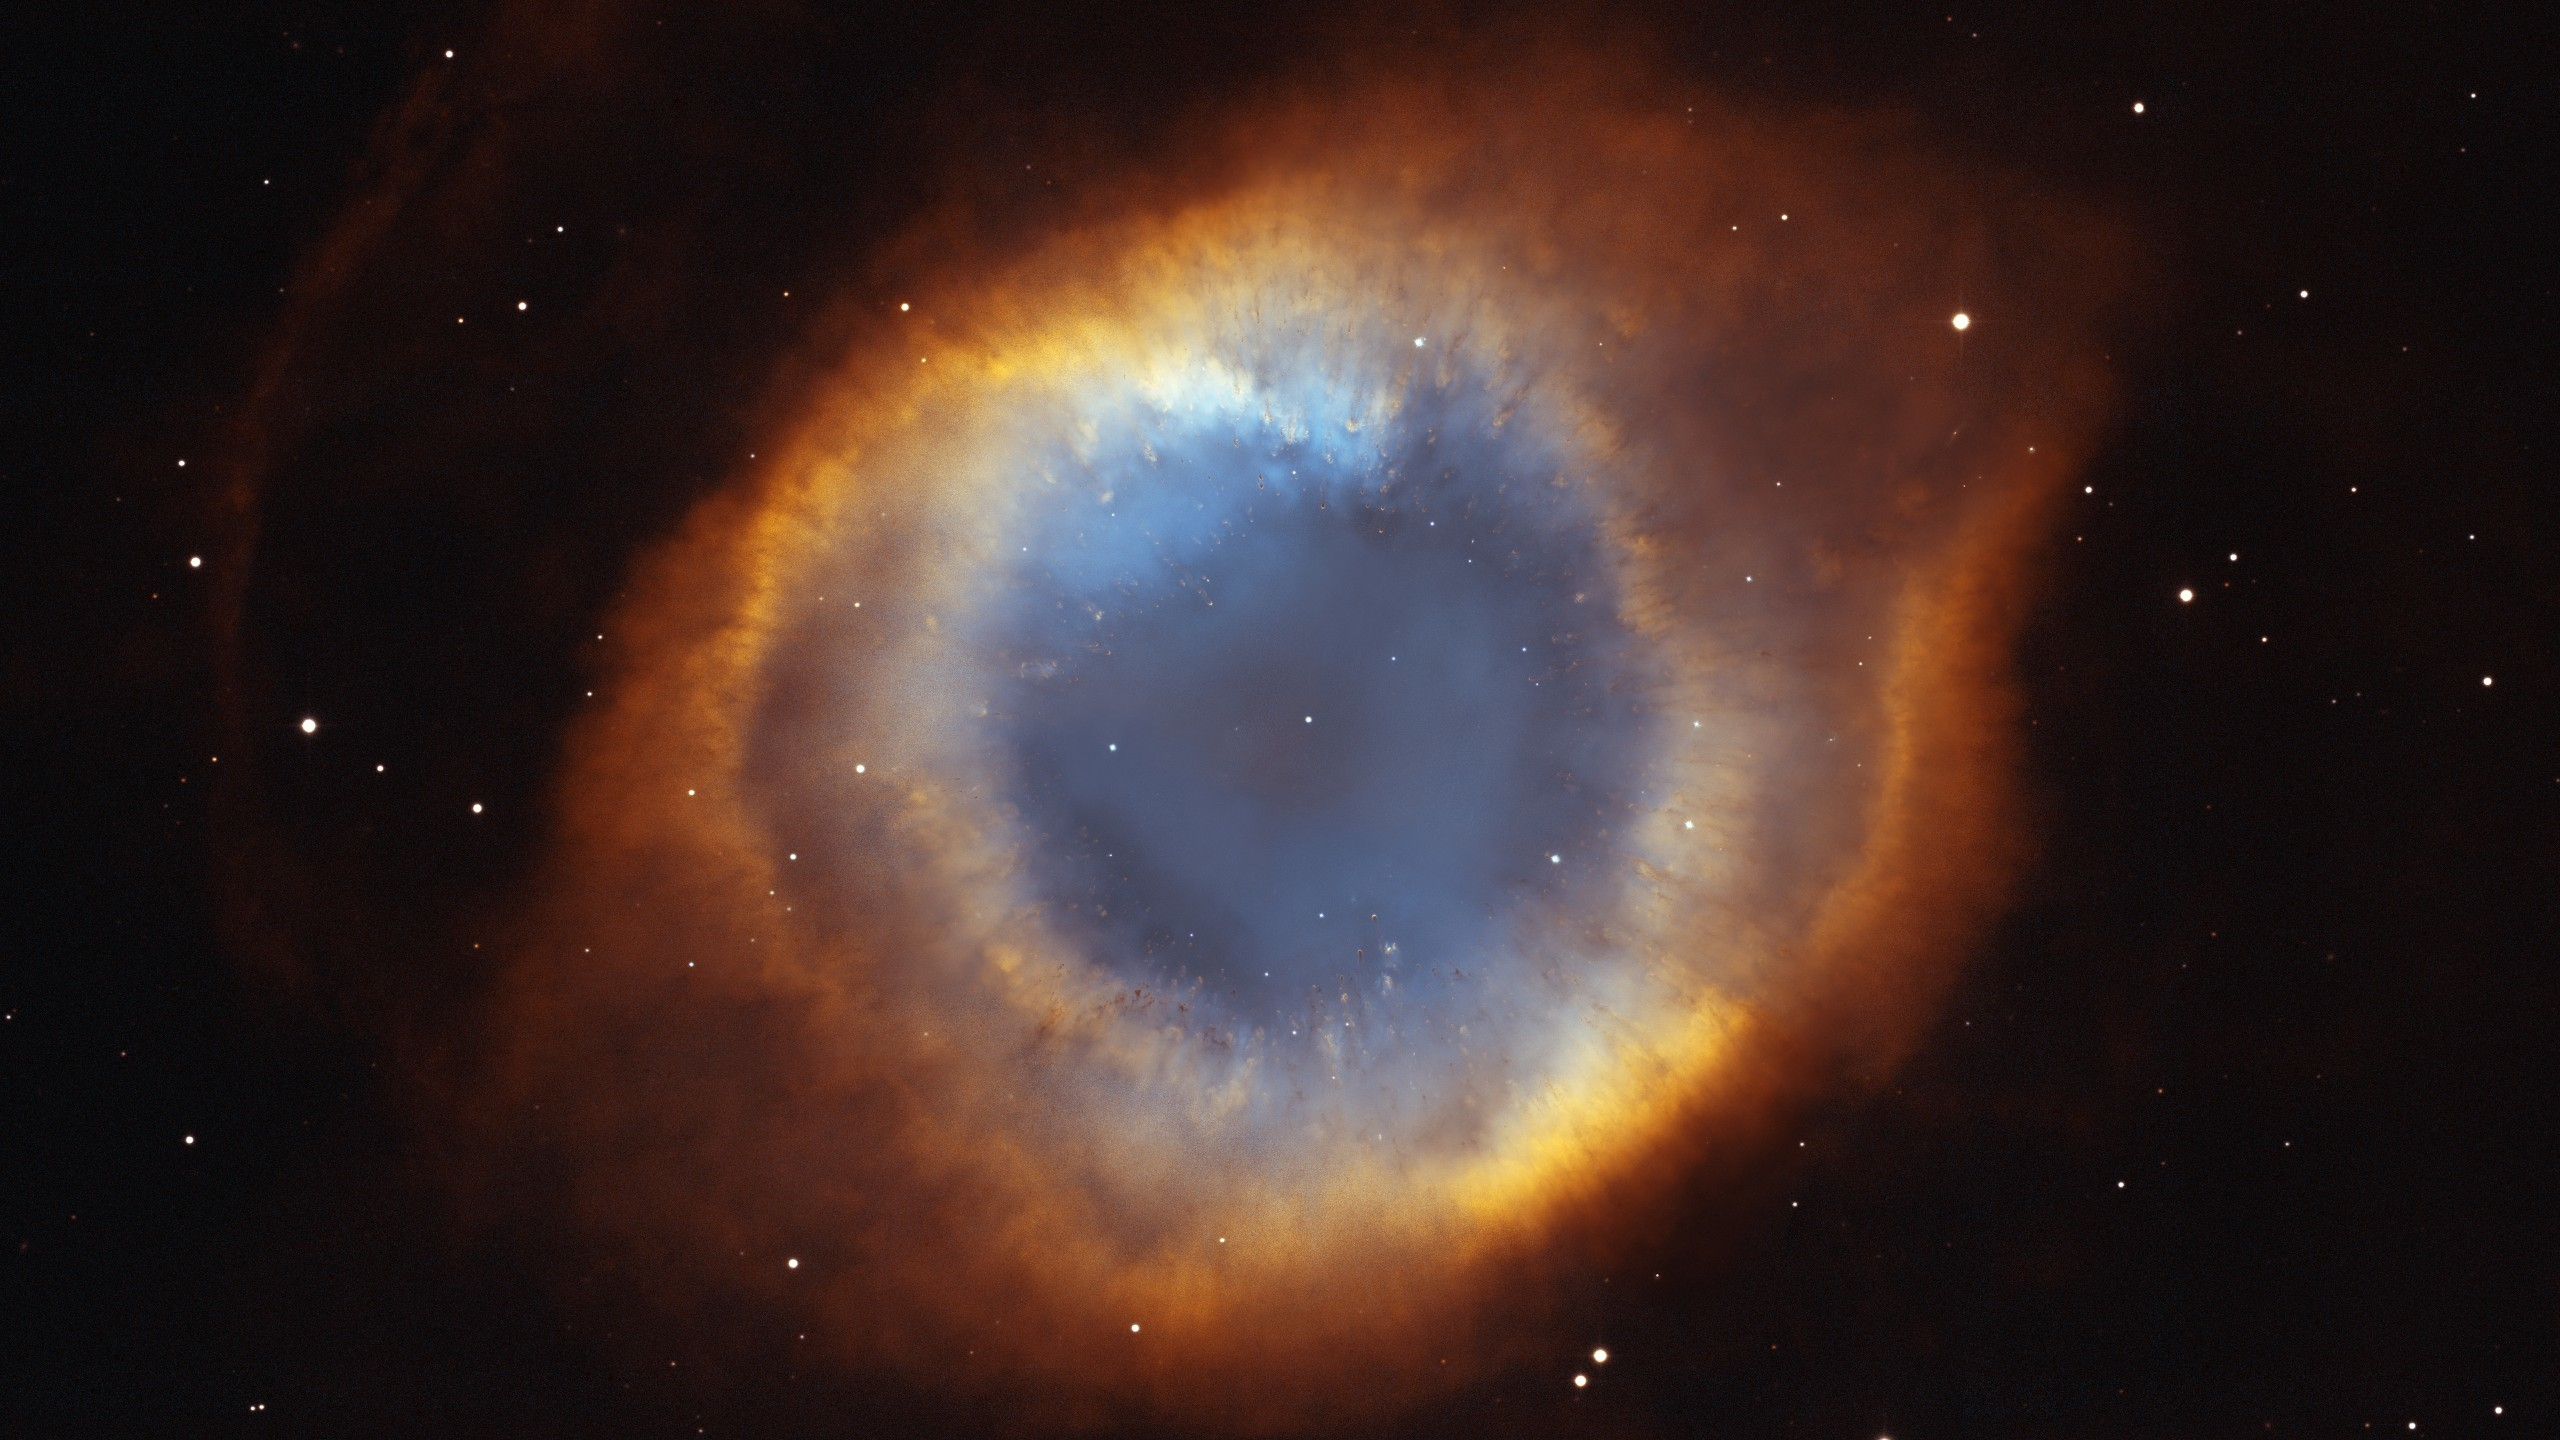 Space / Helix Nebula Wallpaper